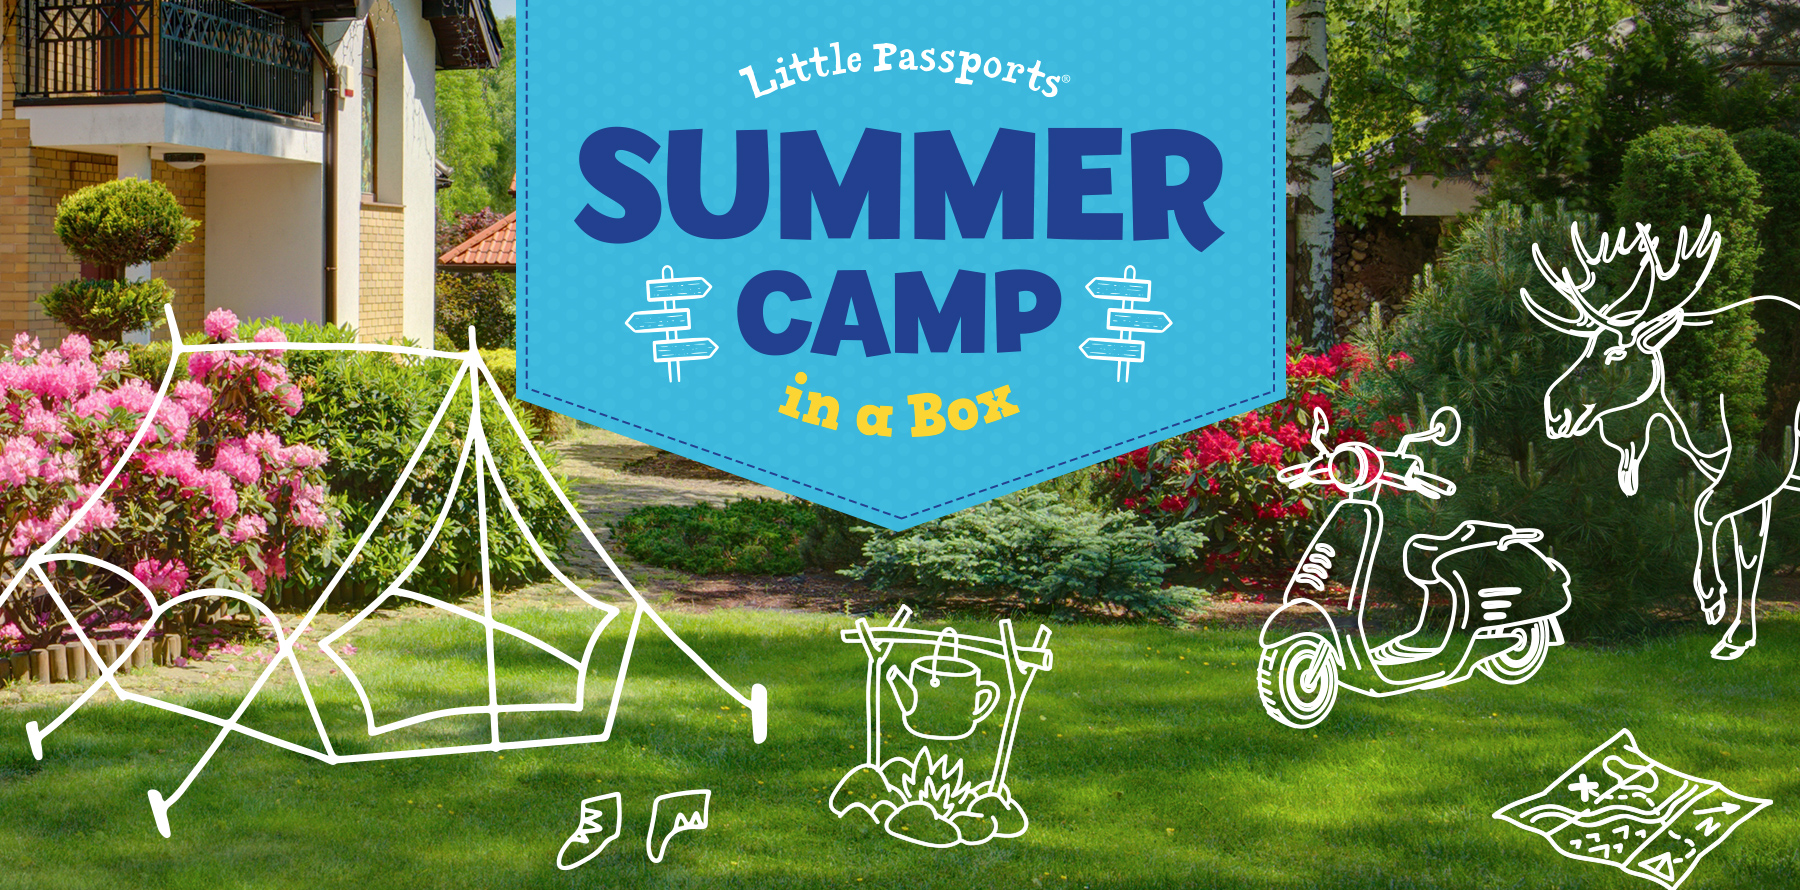 Summer Camp in a Box